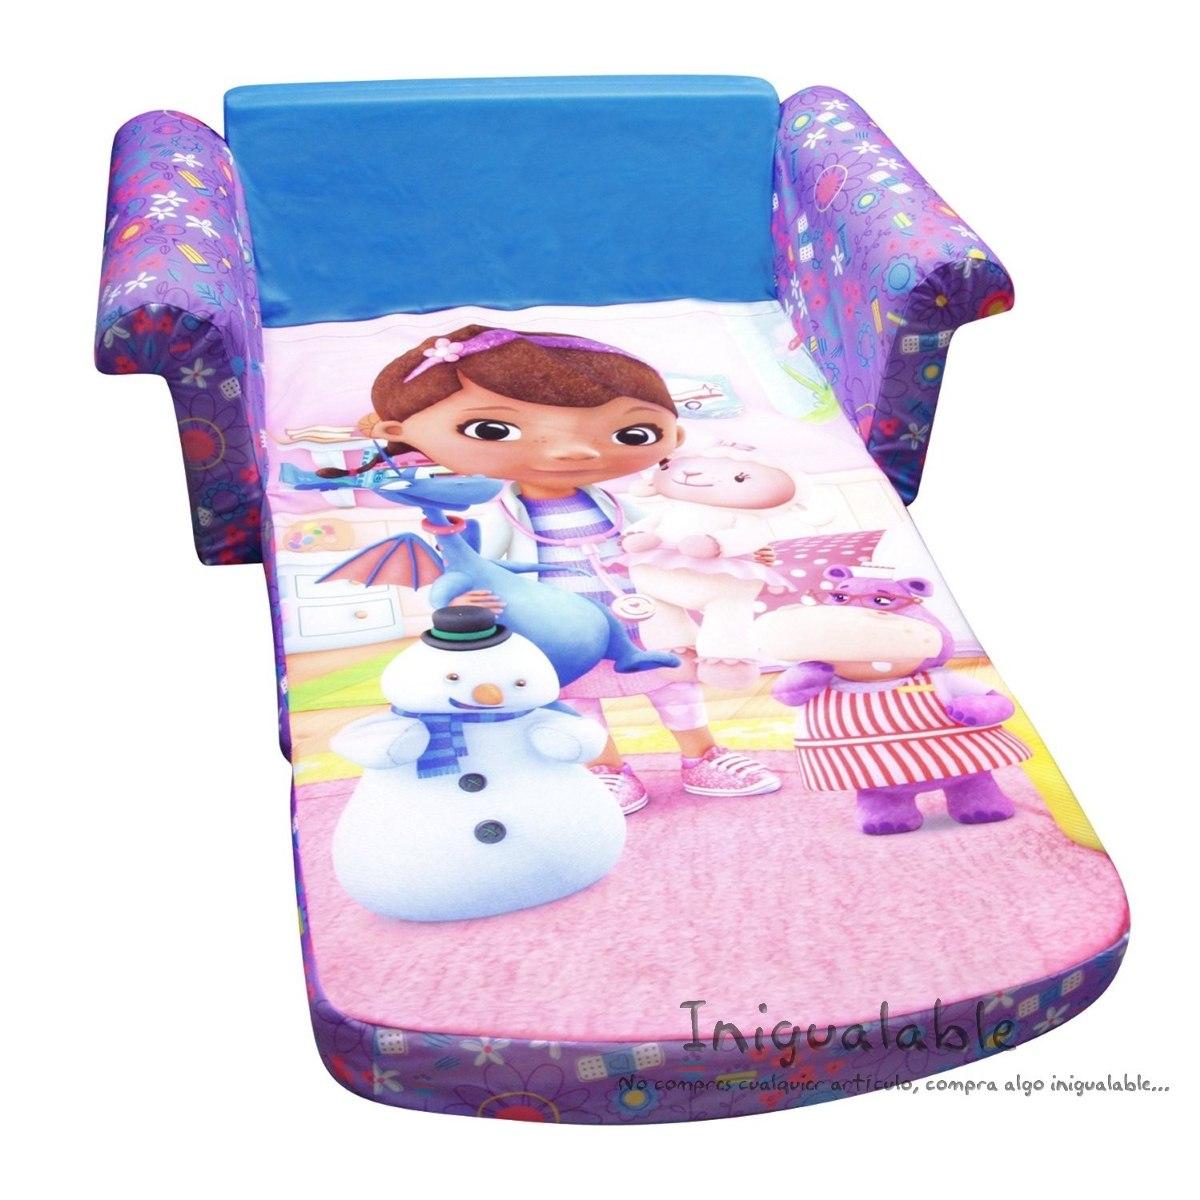 Sofa cama para ni os disney doc mcstuffins 2 en for Divan para ninos